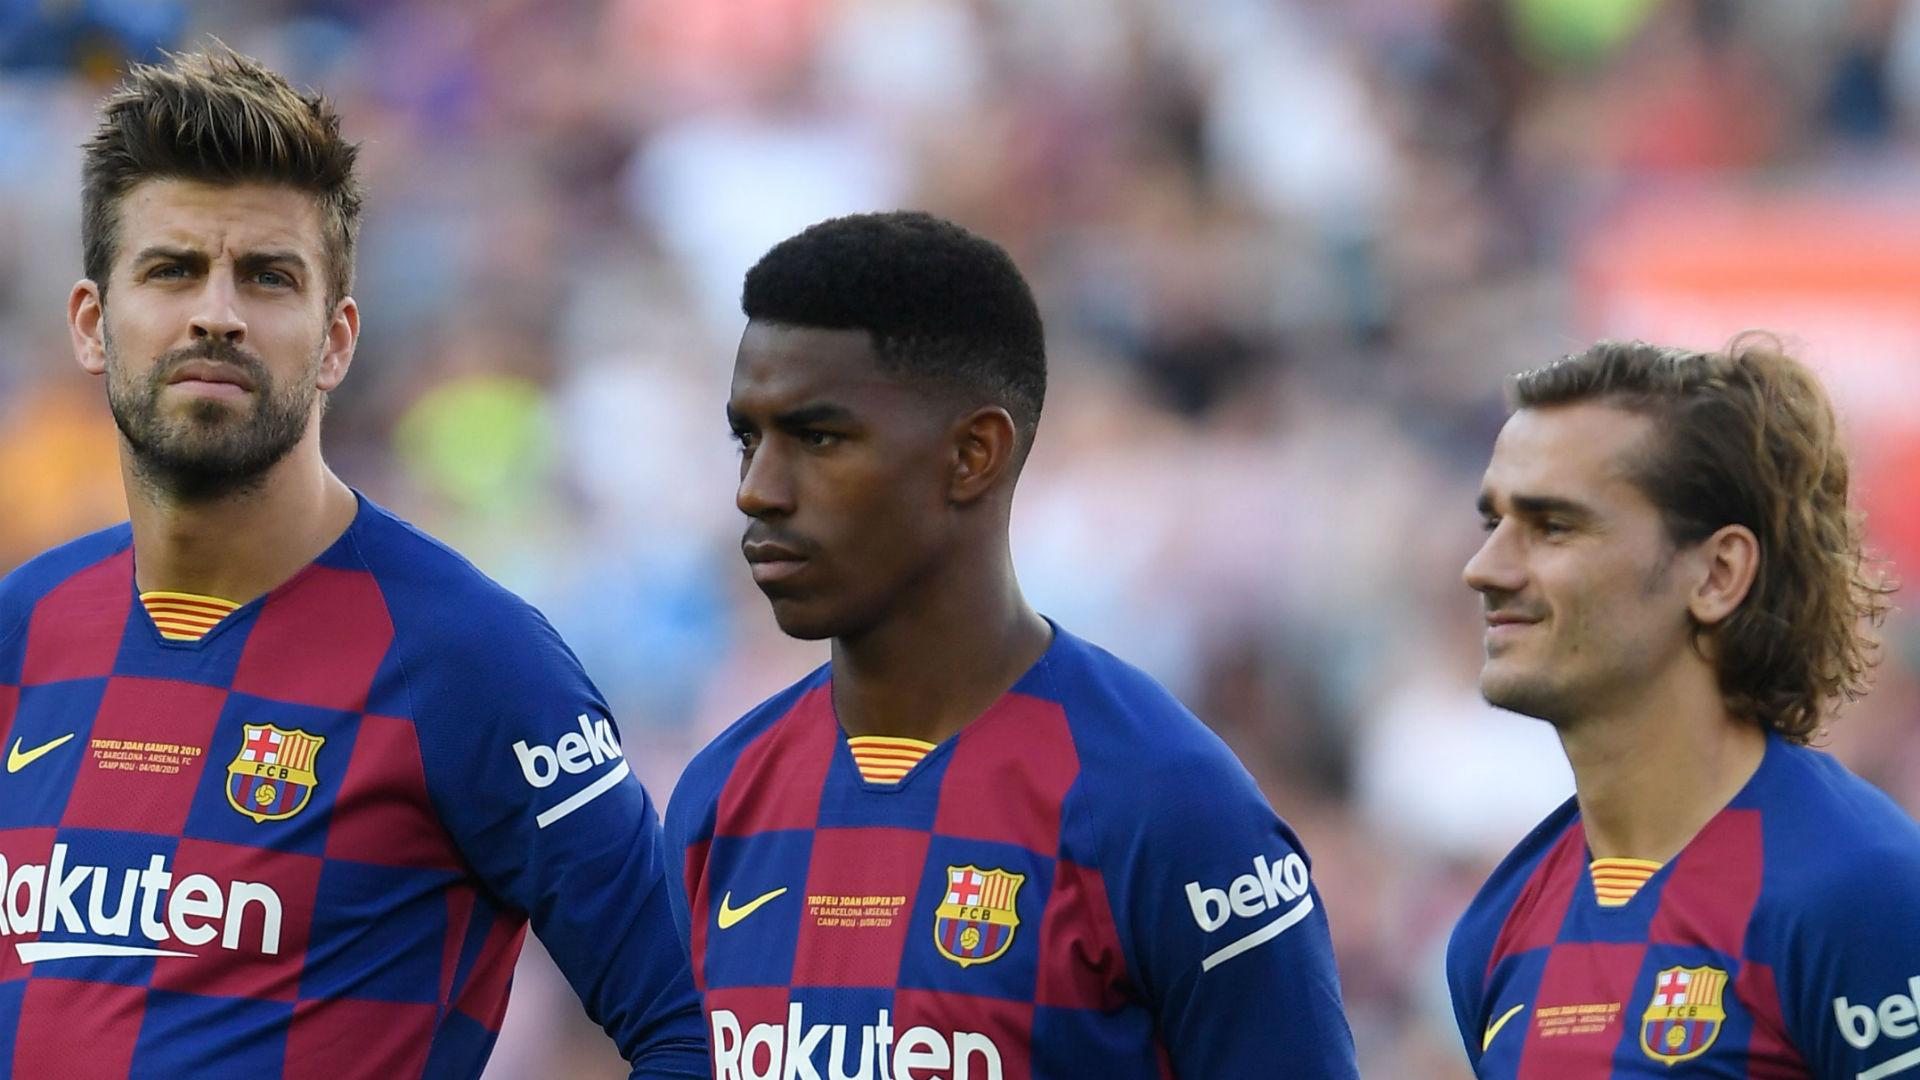 Hector-Junior-Firpo-Adames-Haircut